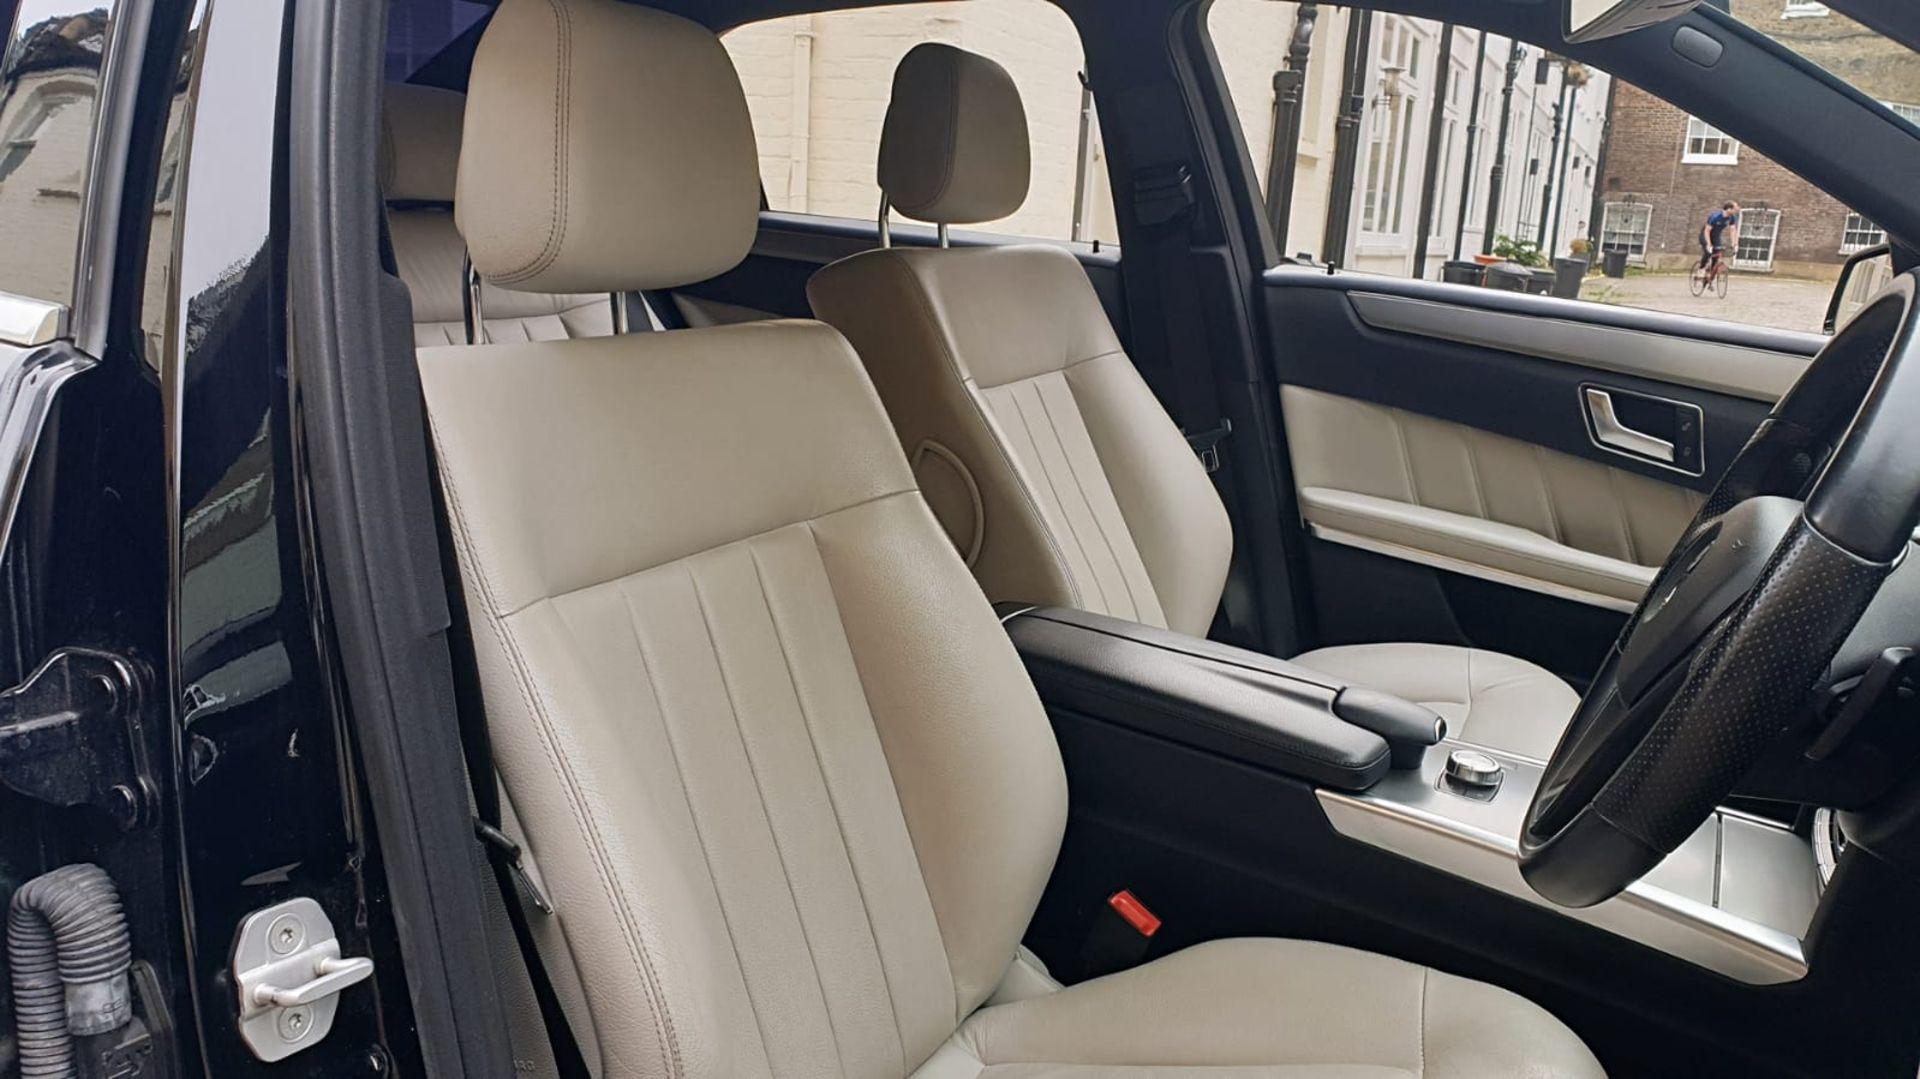 Lot 20 - 2013/13 REG MERCEDES-BENZ E220 SE CDI AUTO 2.2 DIESEL BLACK 4 DOOR SALOON *NO VAT*